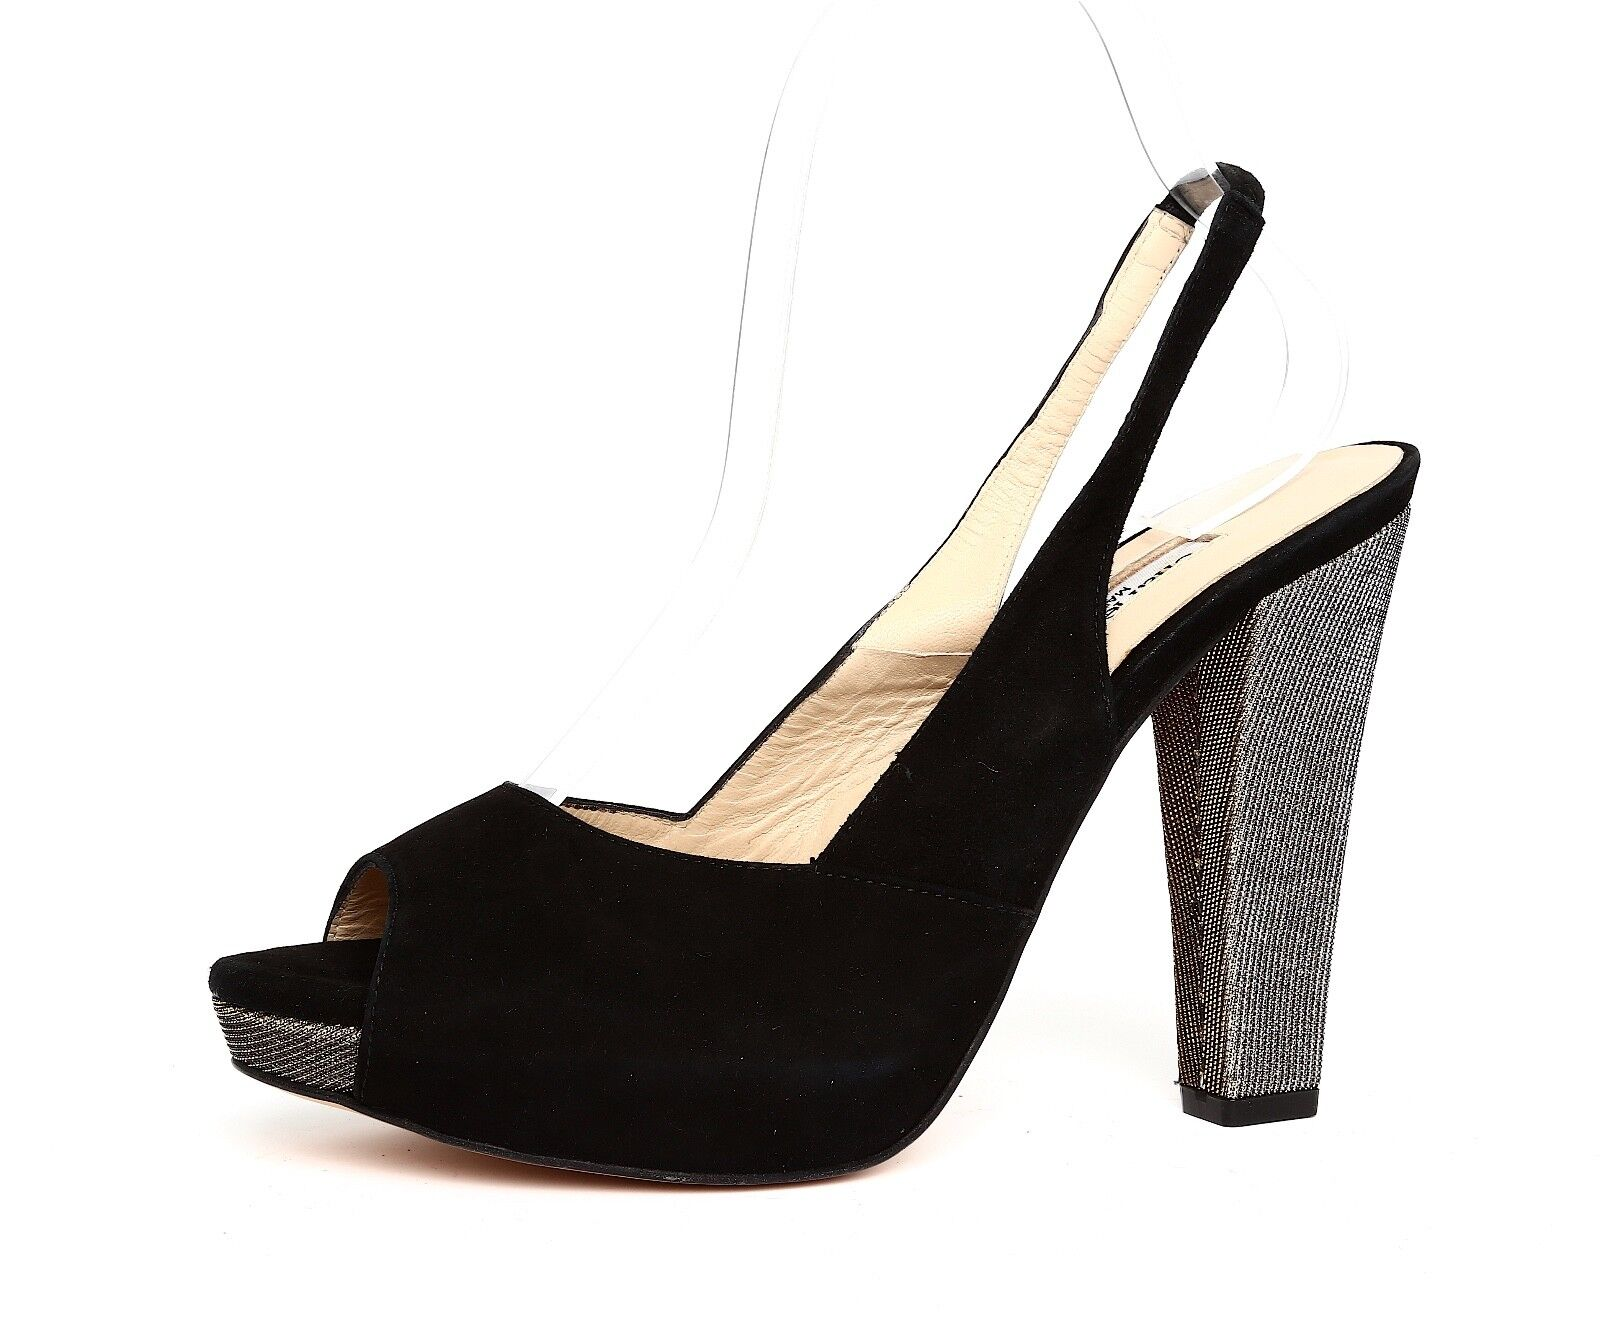 promozioni eccitanti Charles David Donna    nero Metallic High Heel Slingback Sandal Sz 8.5B 2024  colorways incredibili